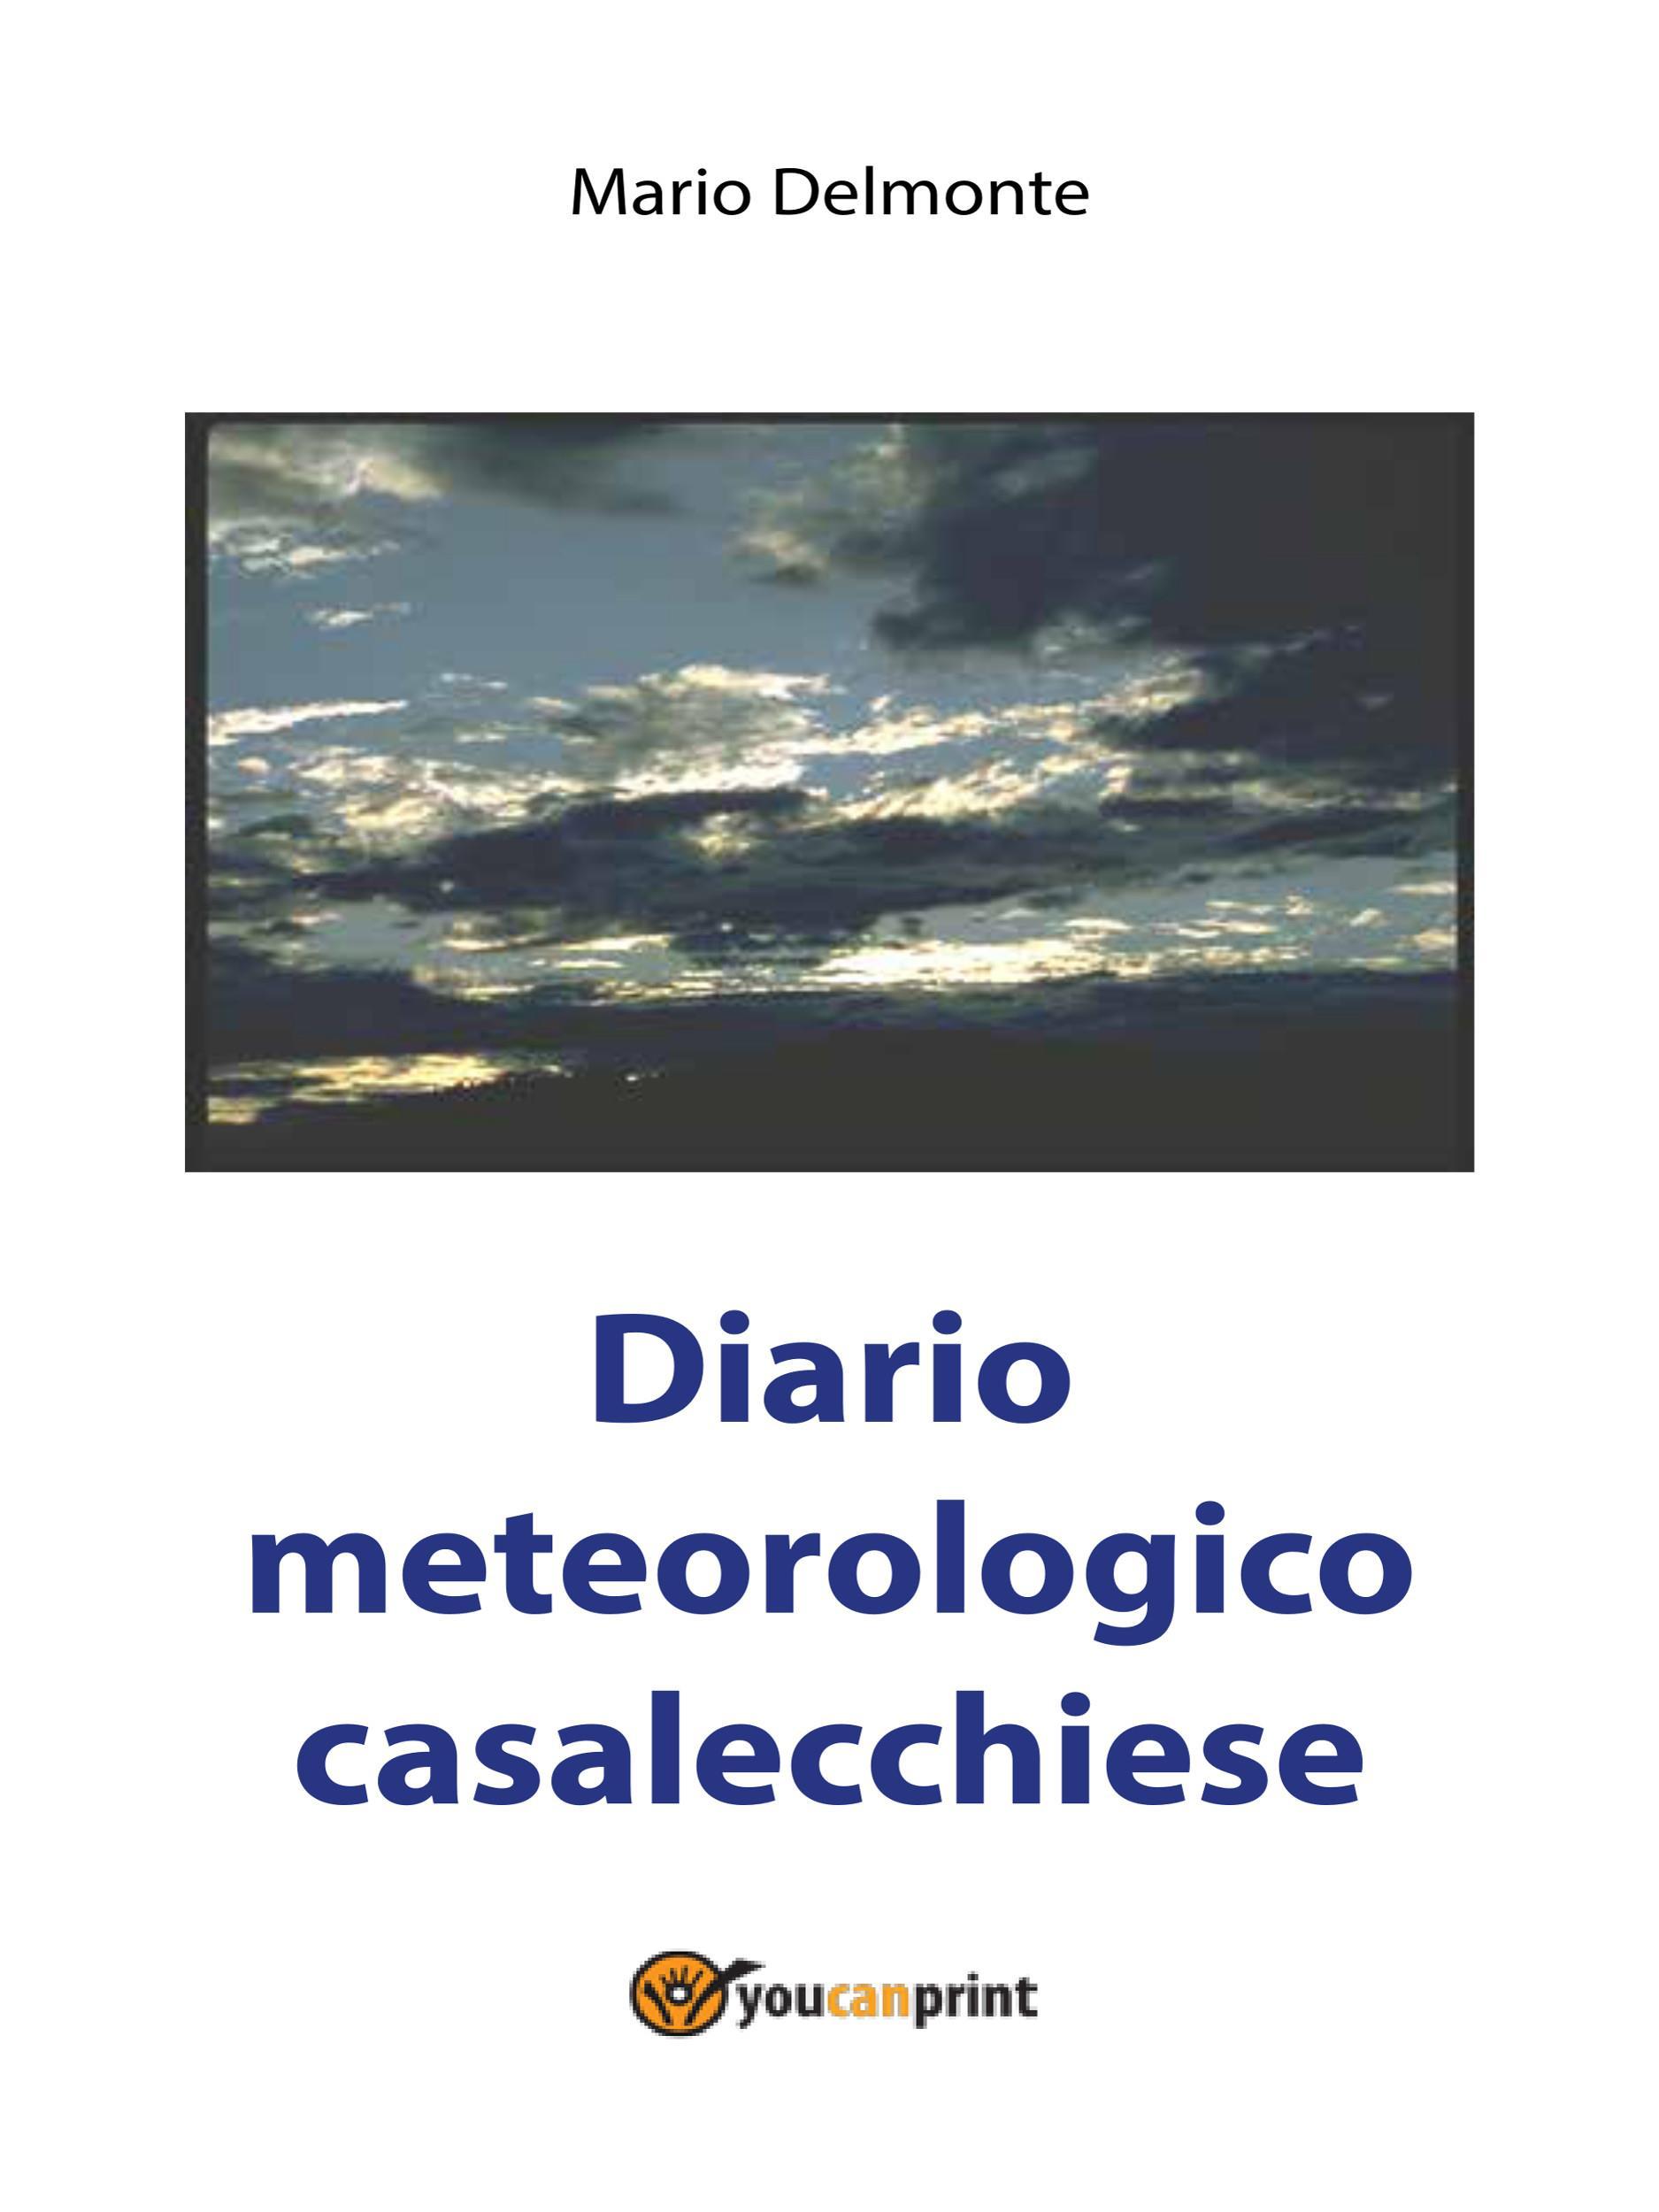 Diario meteorologico casalecchiese